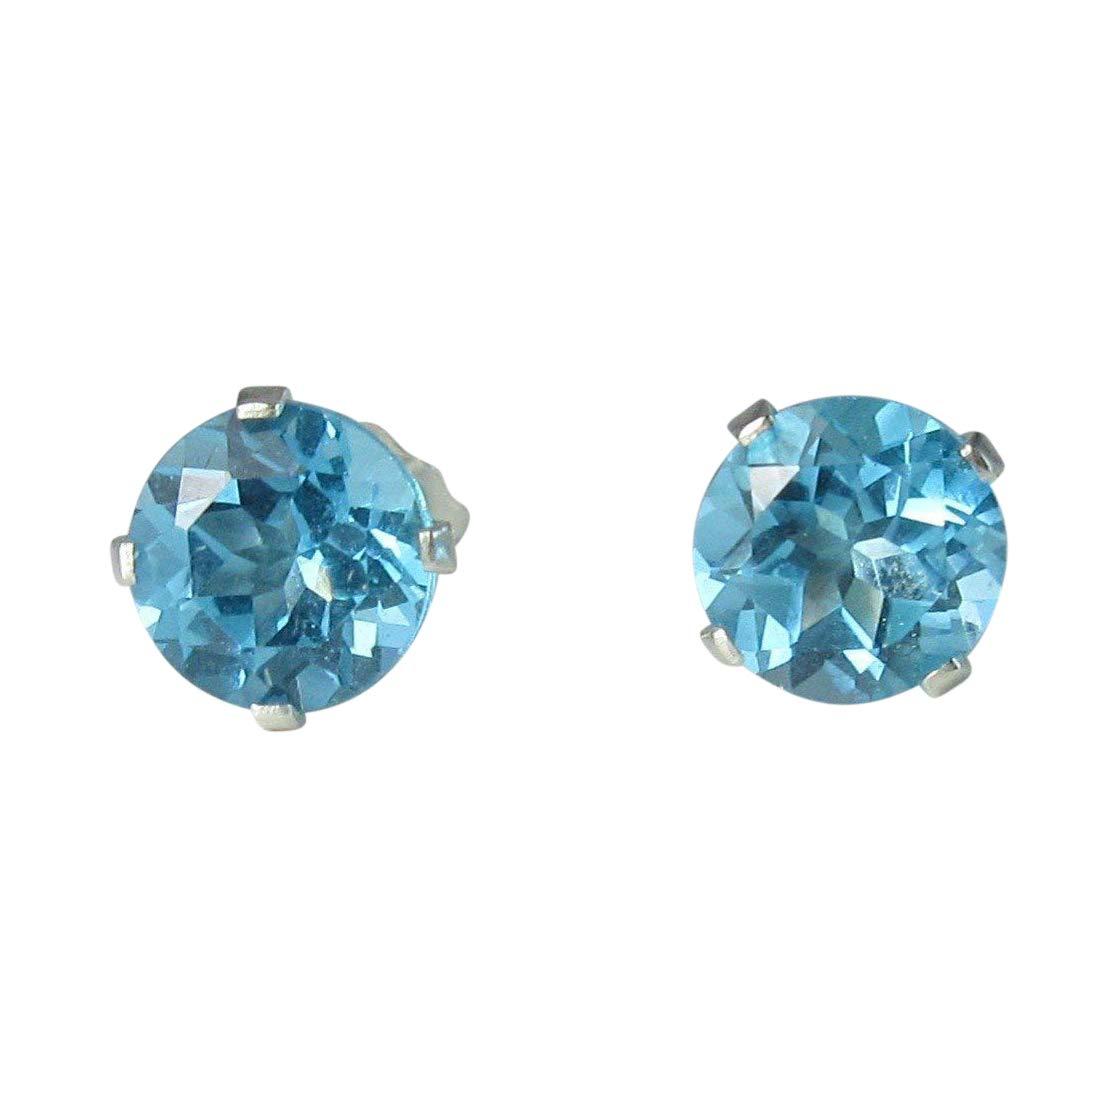 Swiss Blue Topaz Gemstone Columbus Mall 6mm Branded goods Earrings Sterling Studs Silver